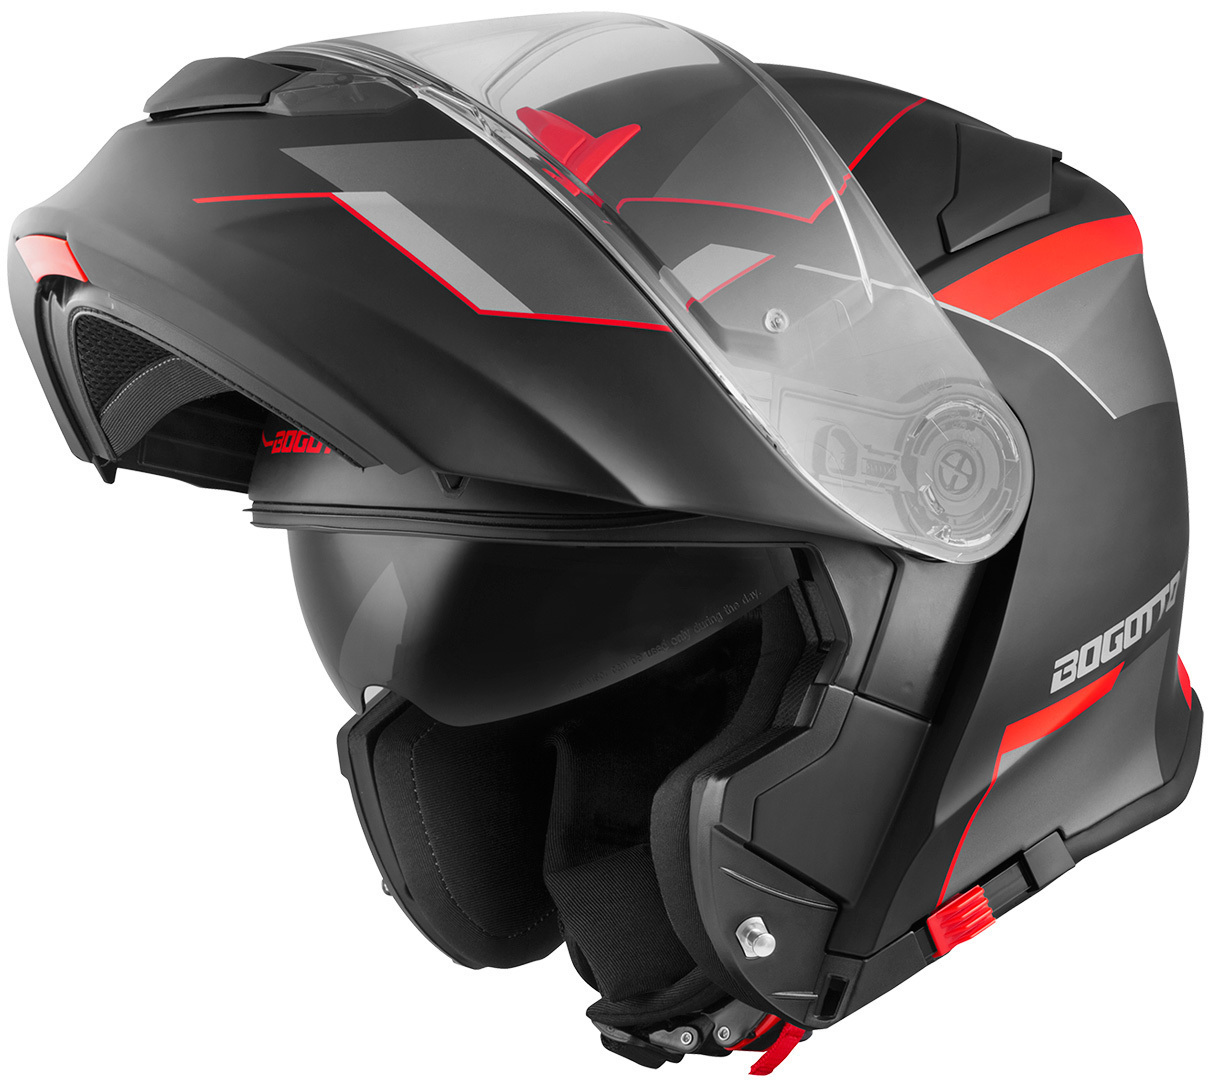 Bogotto V271 Delta Klapphelm, schwarz-rot, Größe 2XL, schwarz-rot, Größe 2XL